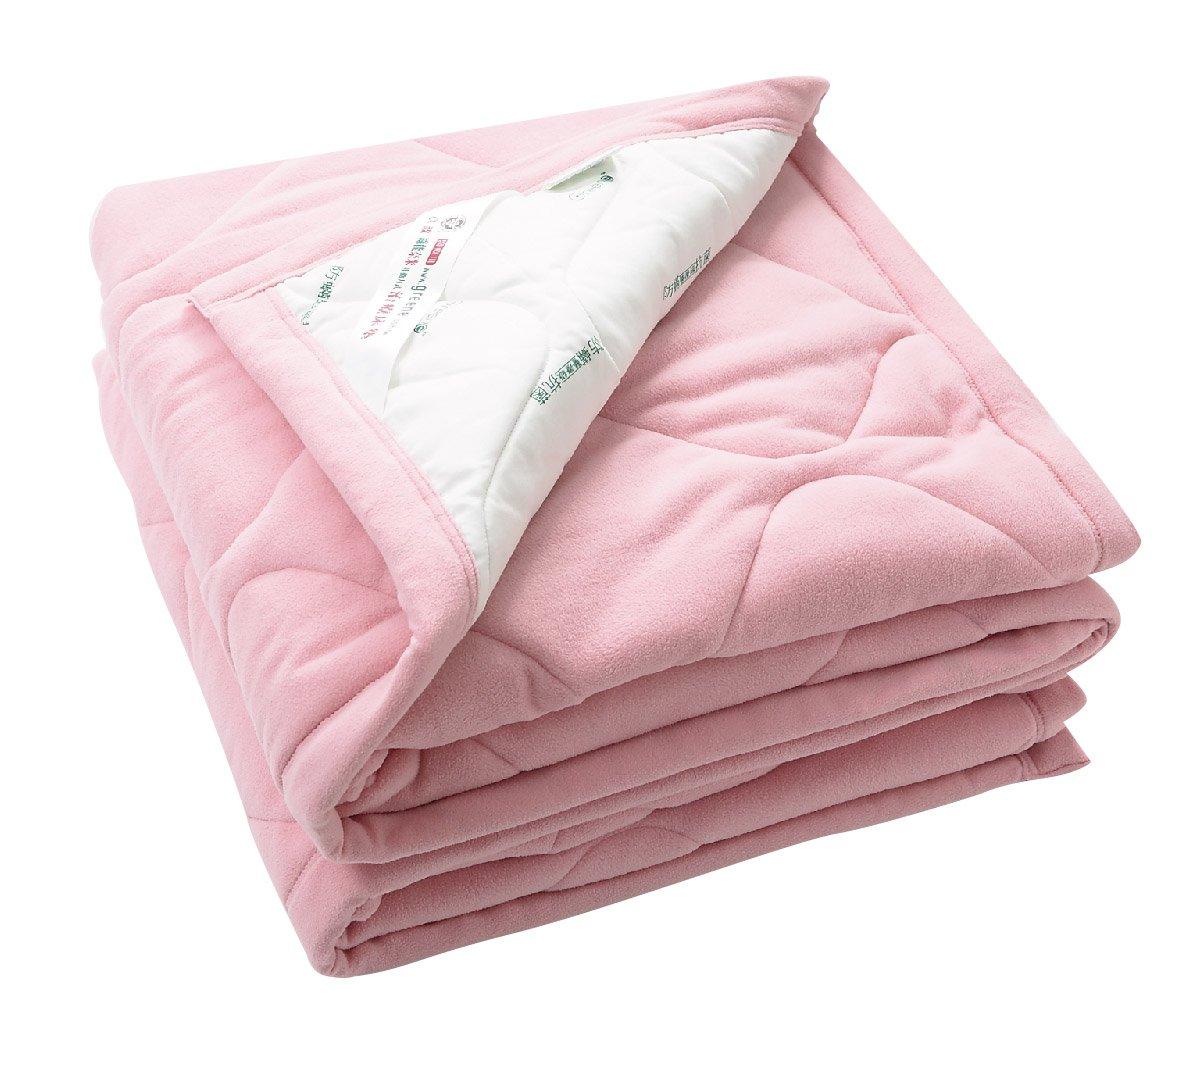 Greene Medical Warm Thermal Blanket Four Seasons Extraソフト生地スーパー通気性カラーピンク/ホワイト150 x 210 cm B00OZCQZSA